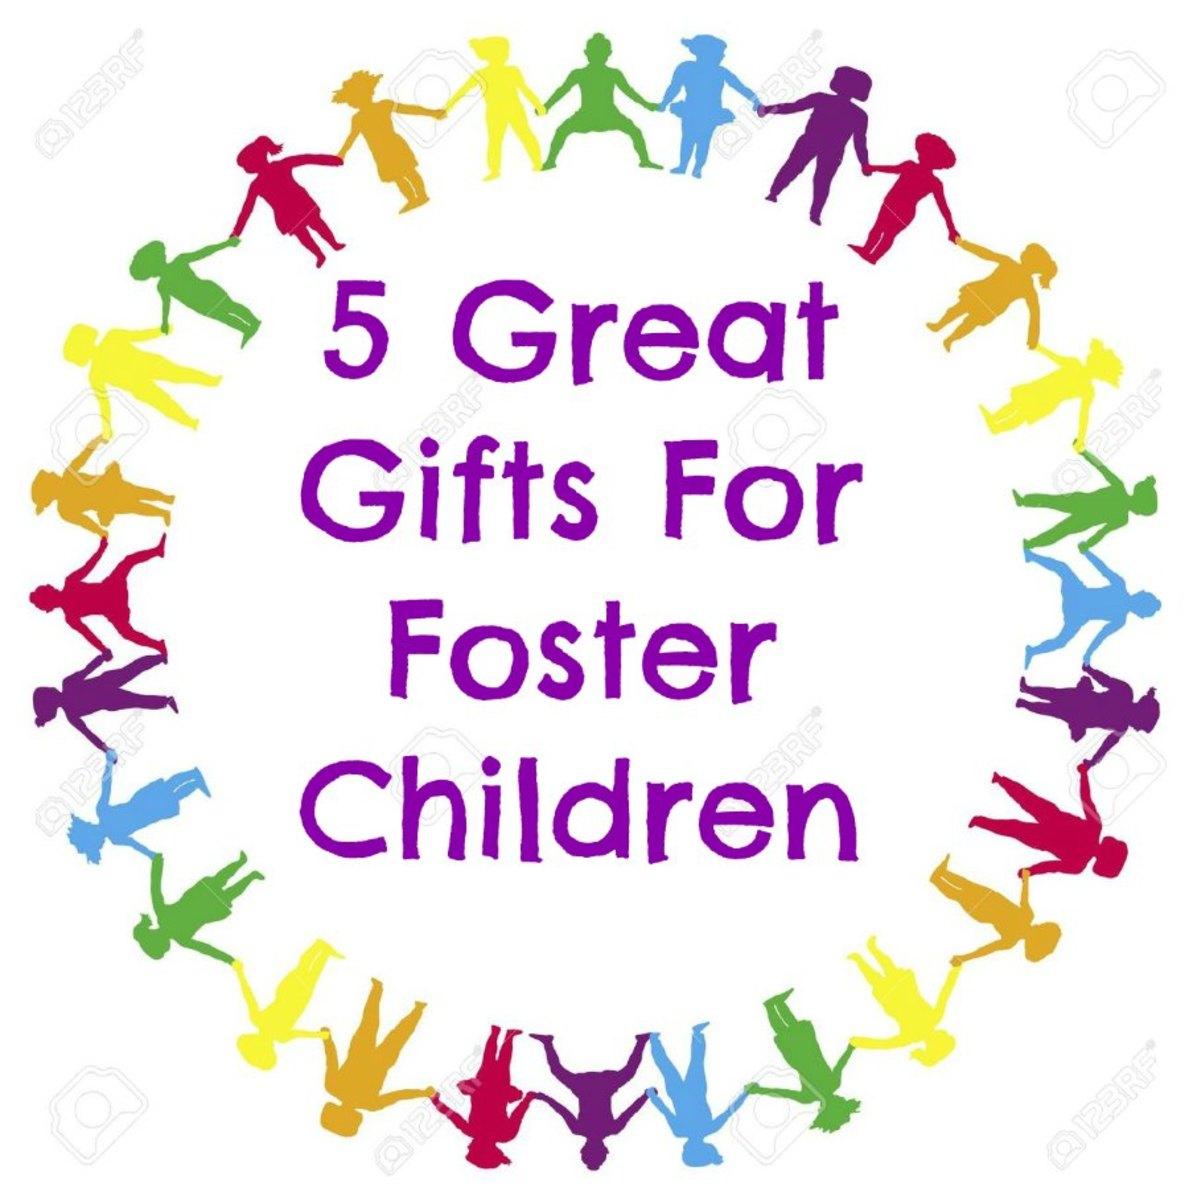 Gift ideas for foster children!